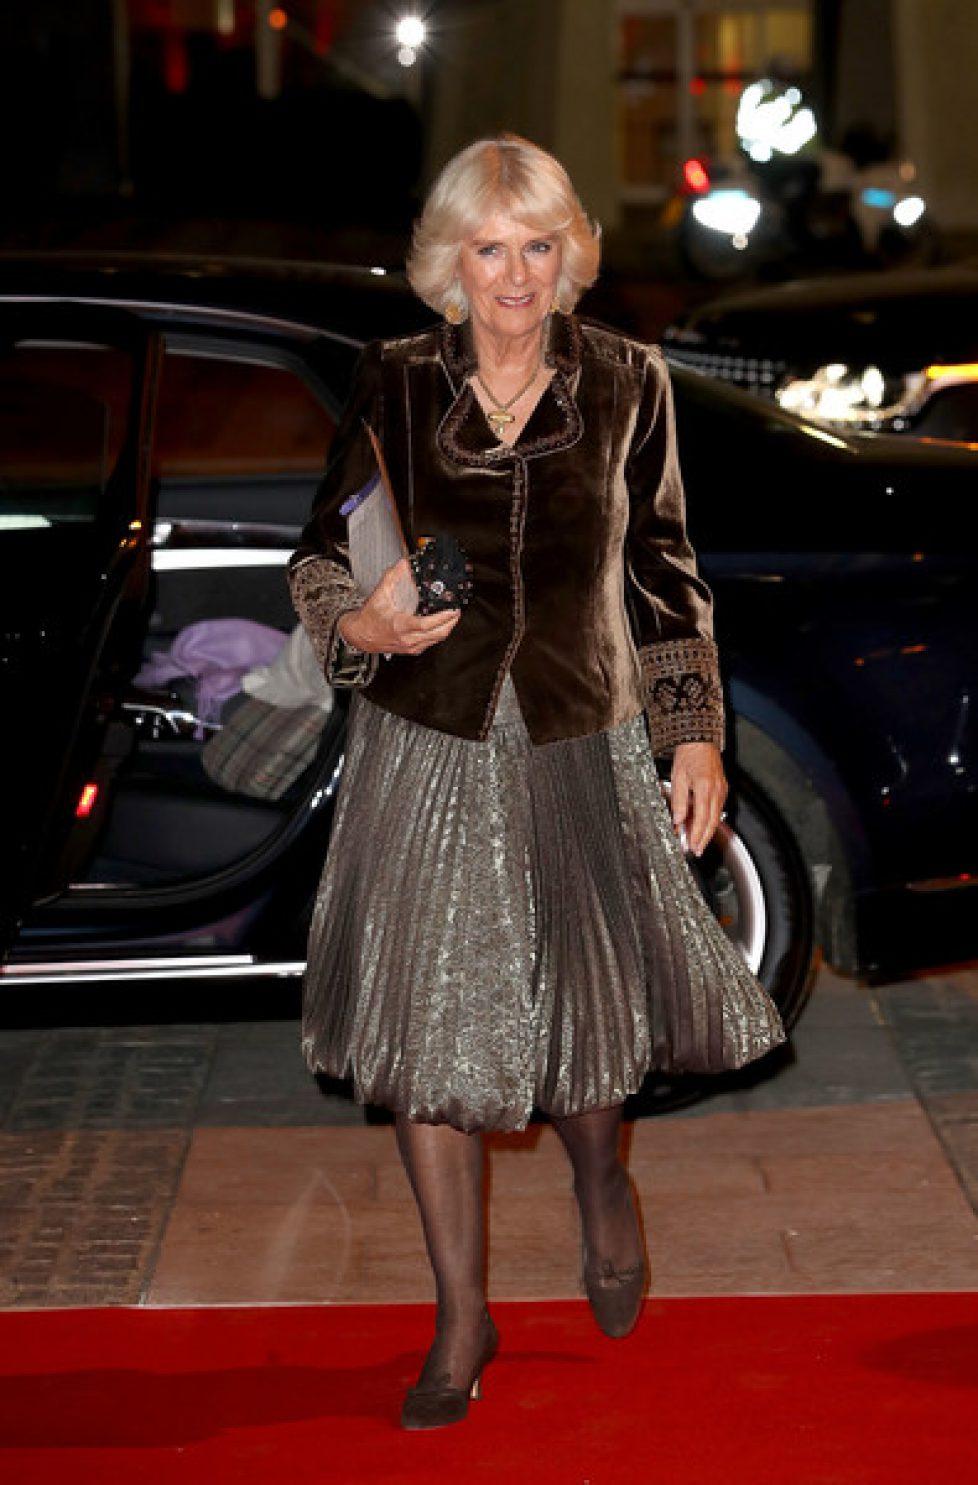 Duchess+Cornwall+Attends+Man+Booker+Prize+wfLvUeHMZTrl